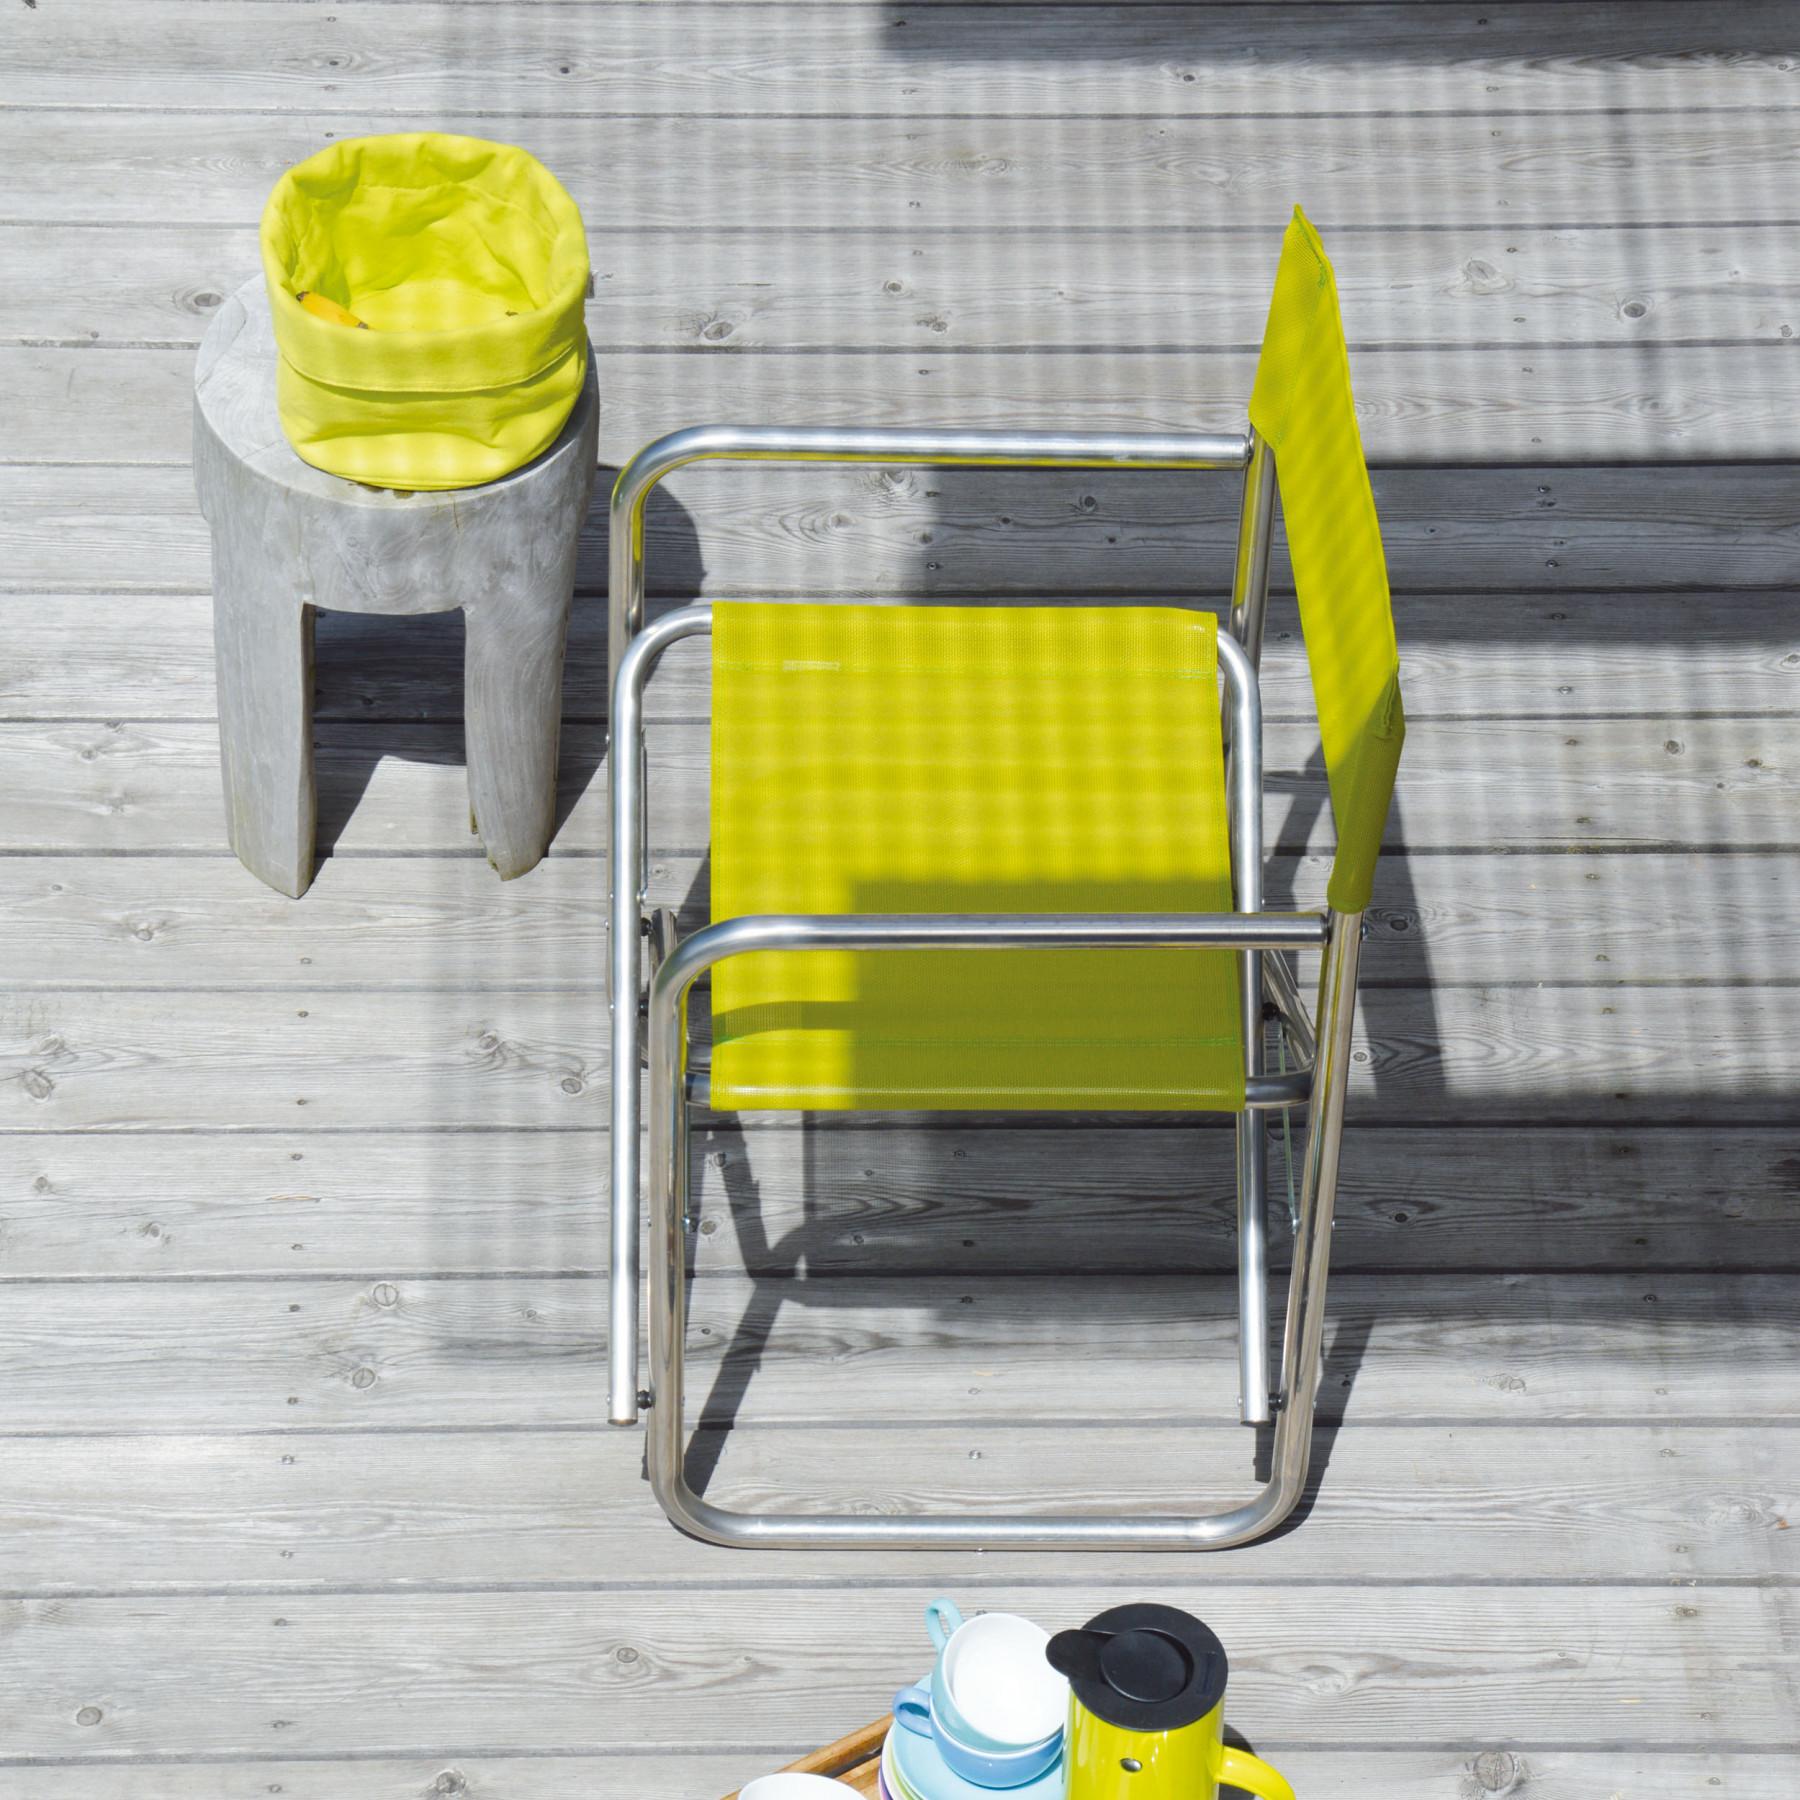 Balkonmöbel Alu Wetterfest 2021